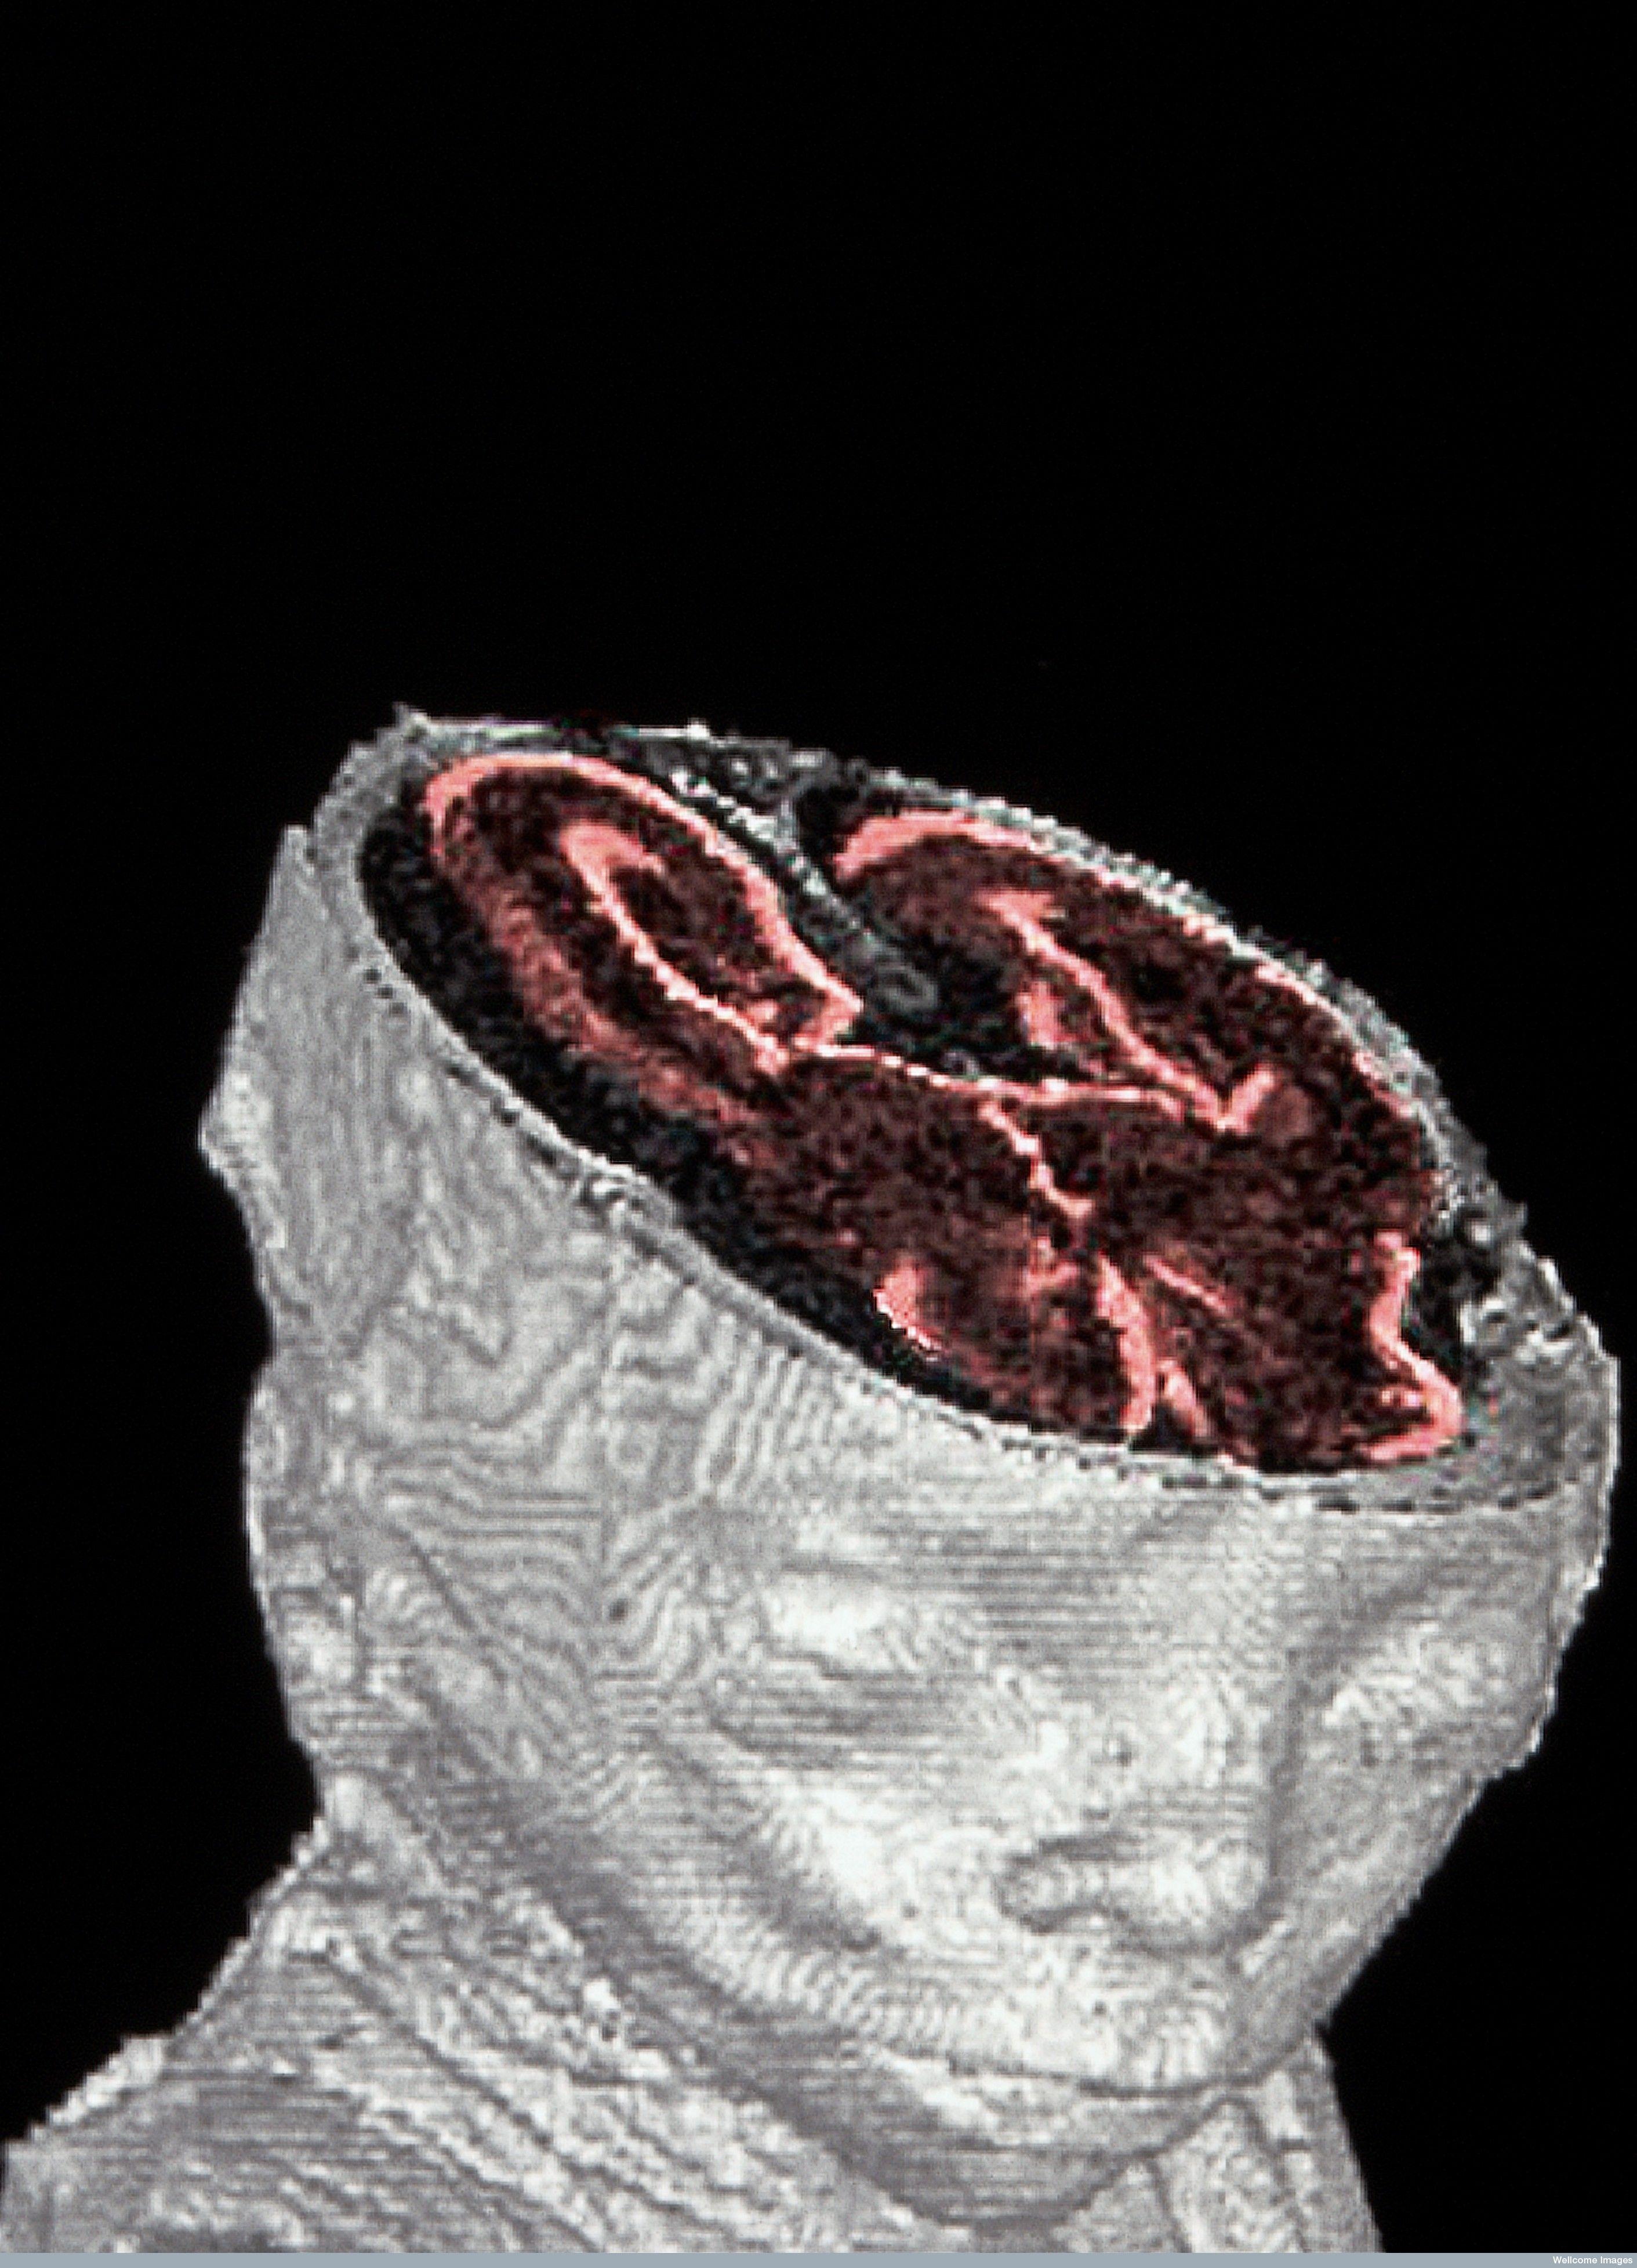 Foetal MRI scan A high resolution magnetic resonance imaging (HRMRI ...